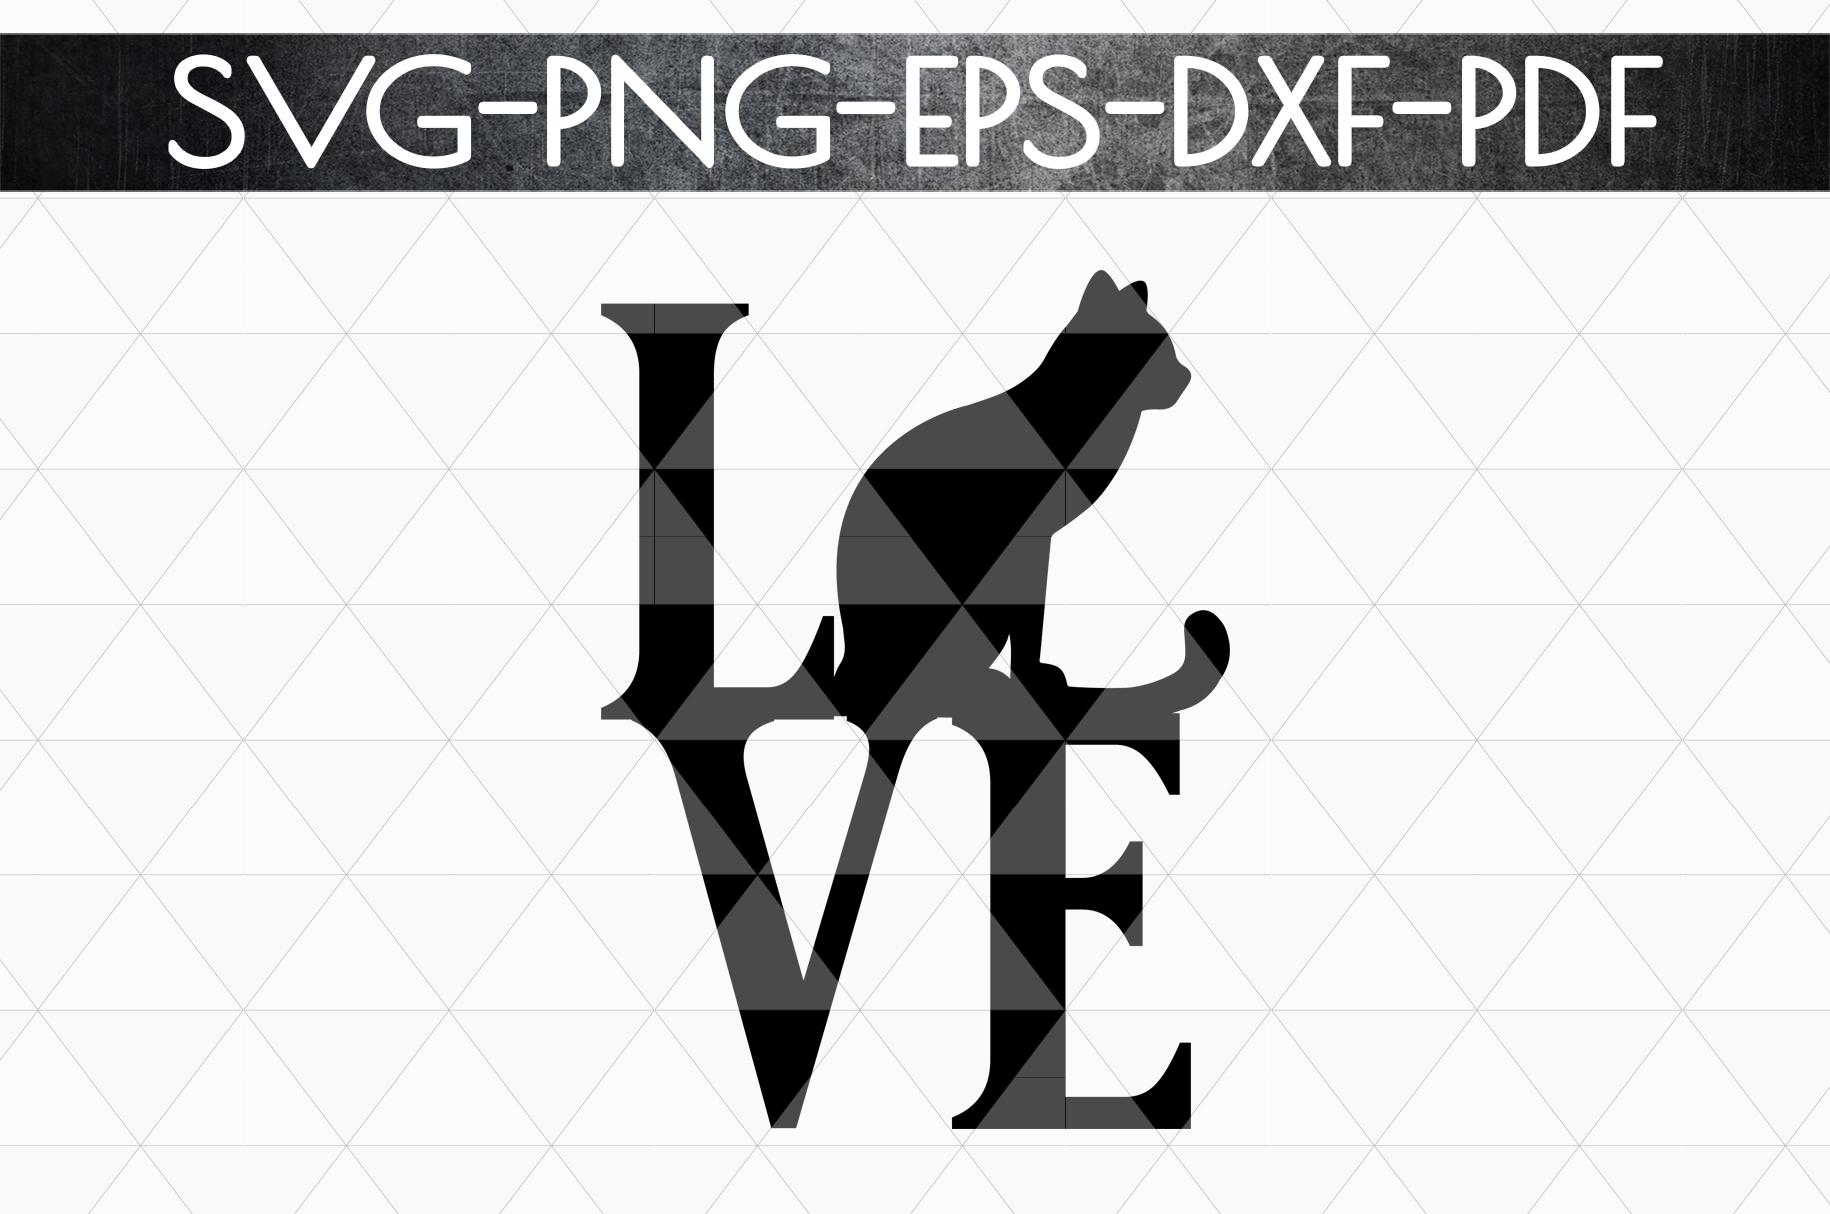 Cat Love Papercut Template, Cat Lover Decor, SVG, DXF PDF example image 4